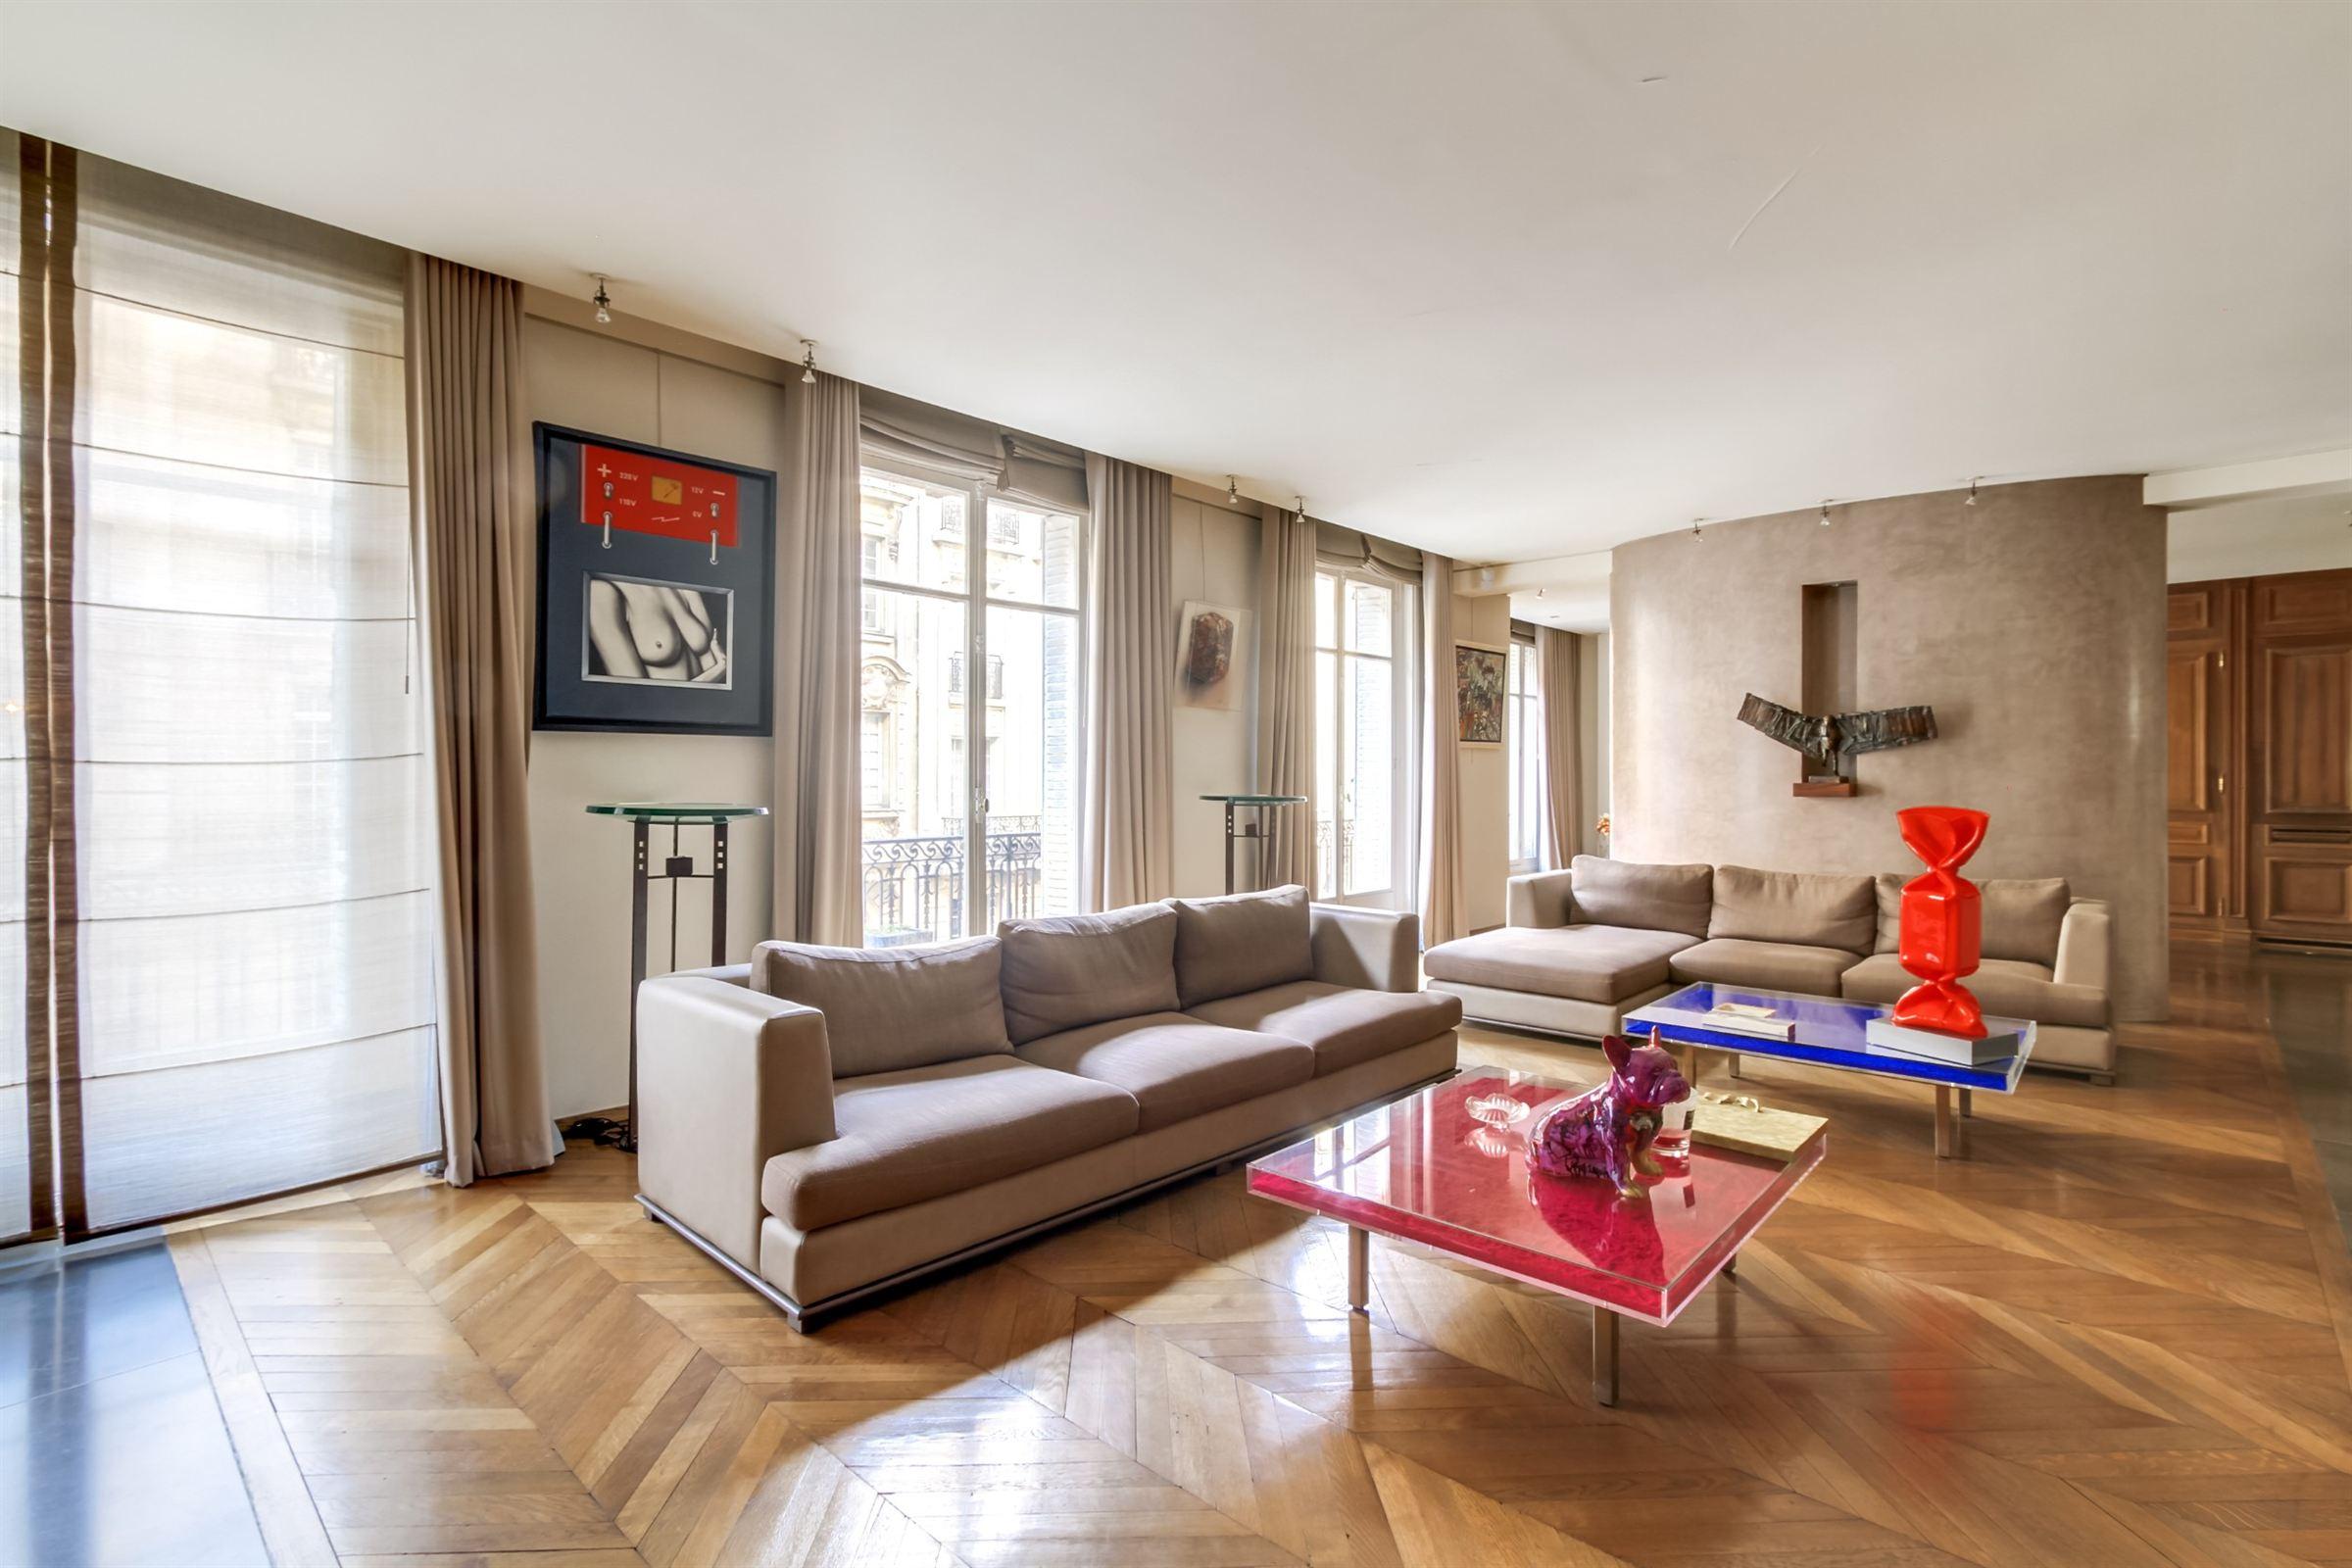 Apartamento por un Venta en Paris 17 - Courcelles/Wagram. Family apartment of 280 sq.m Paris, Paris 75017 Francia